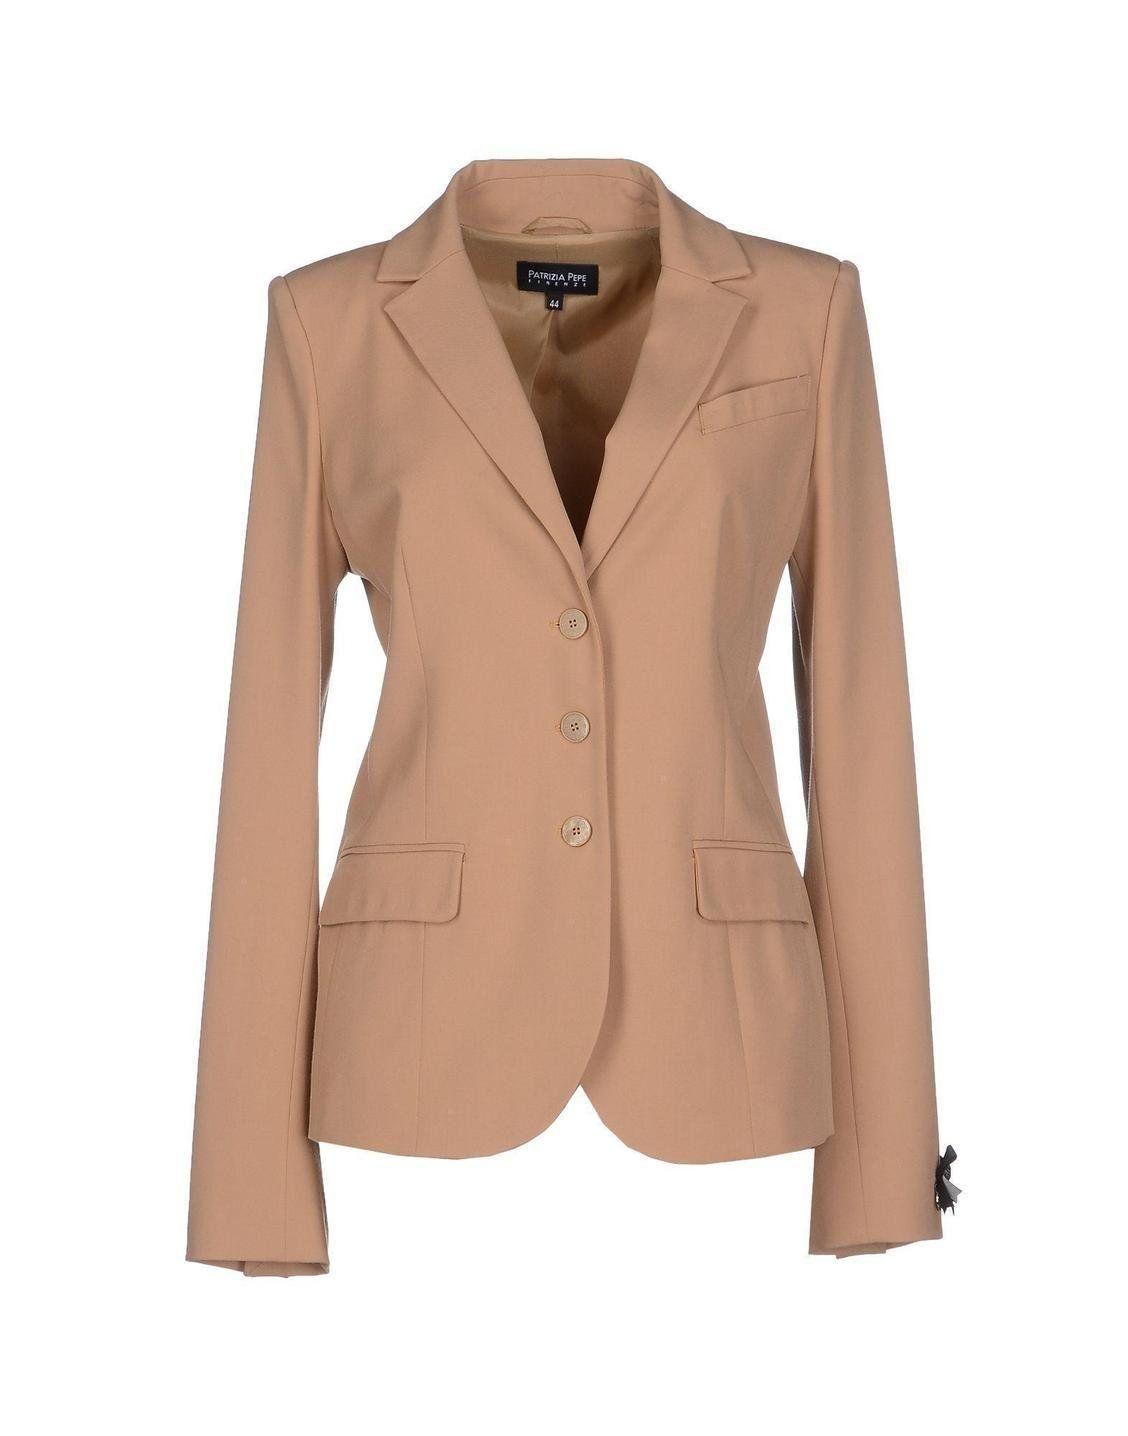 Blazer http://picvpic.com/women-coats-jackets-jackets-blazers/blazer-56df5e04-7fc1-41f4-89a6-1682f76f160b#Camel